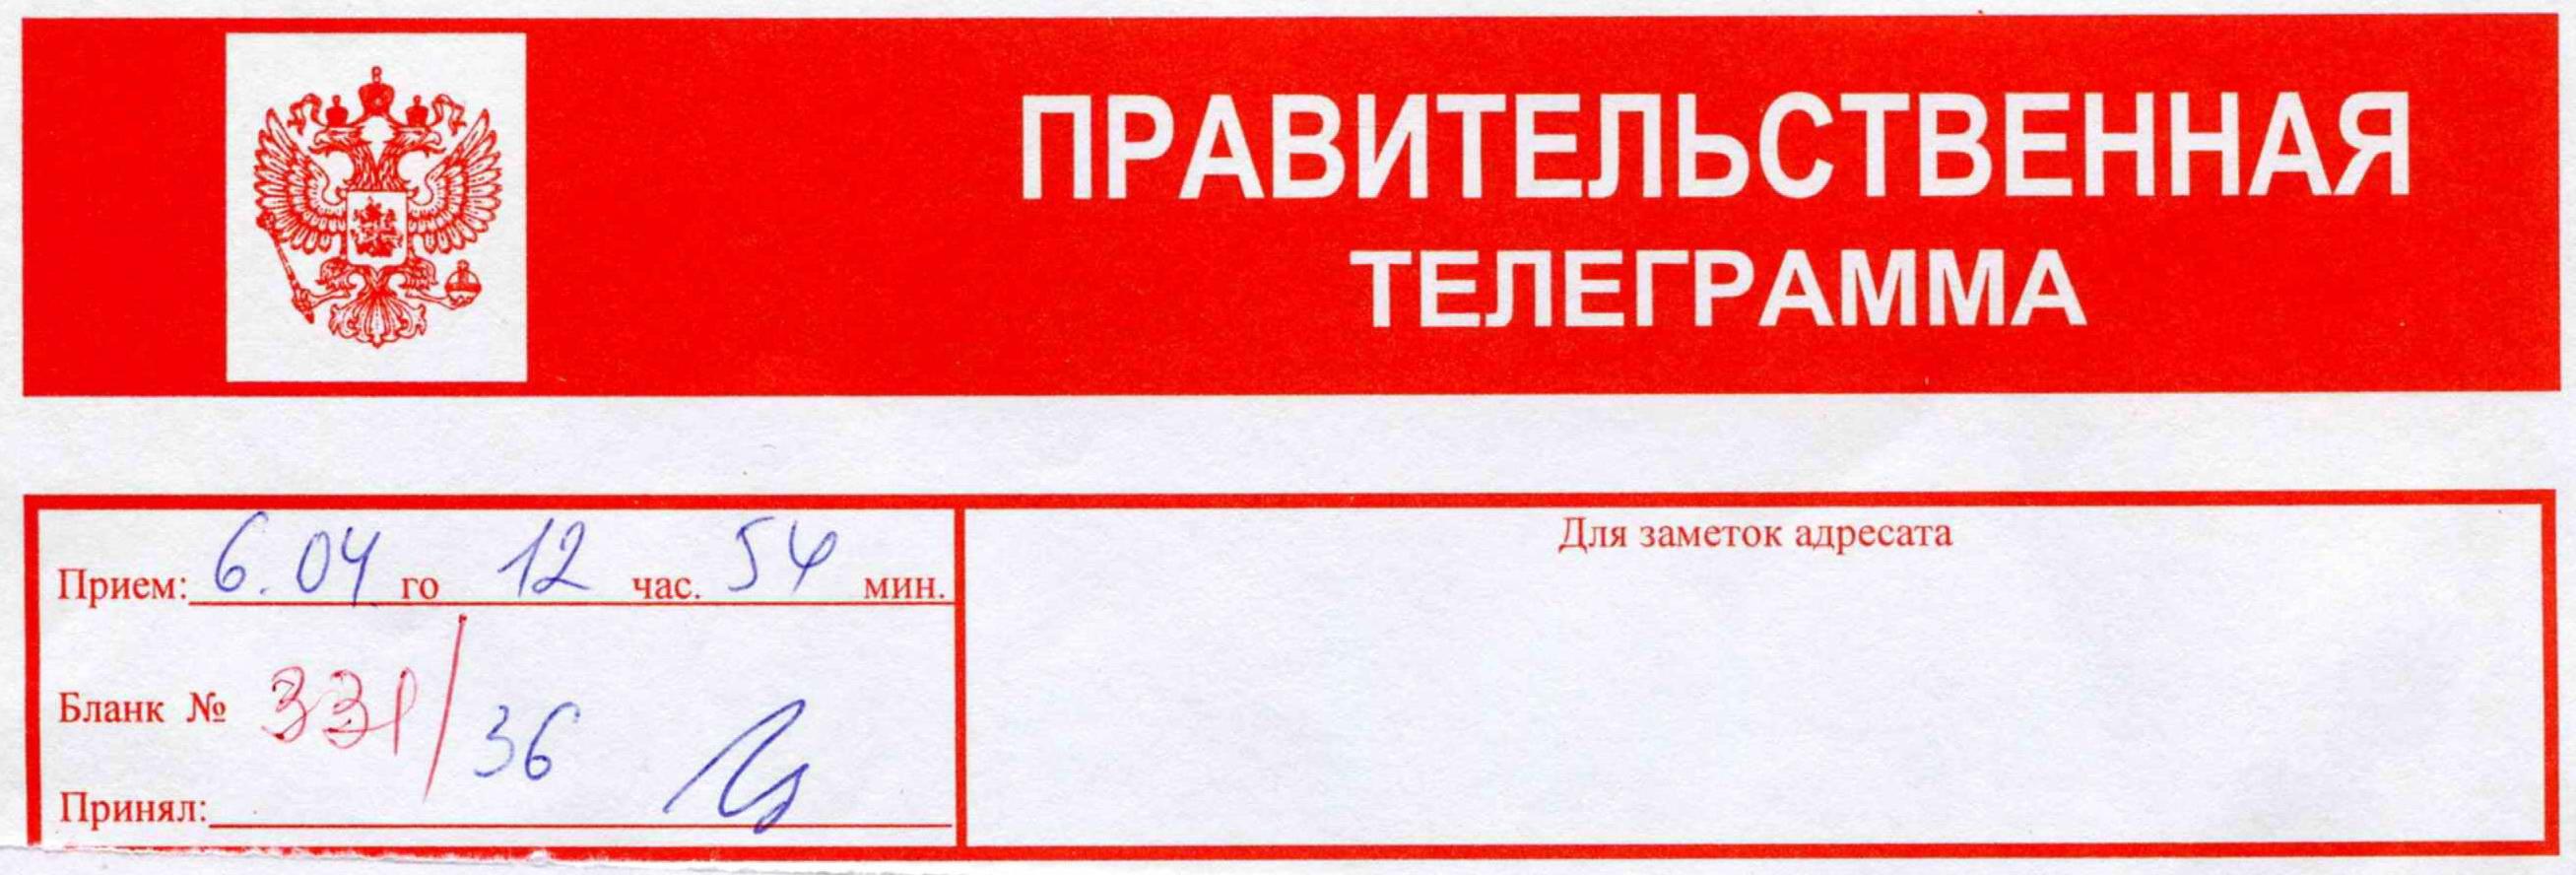 01 telegramma ot Seslavinskogo00